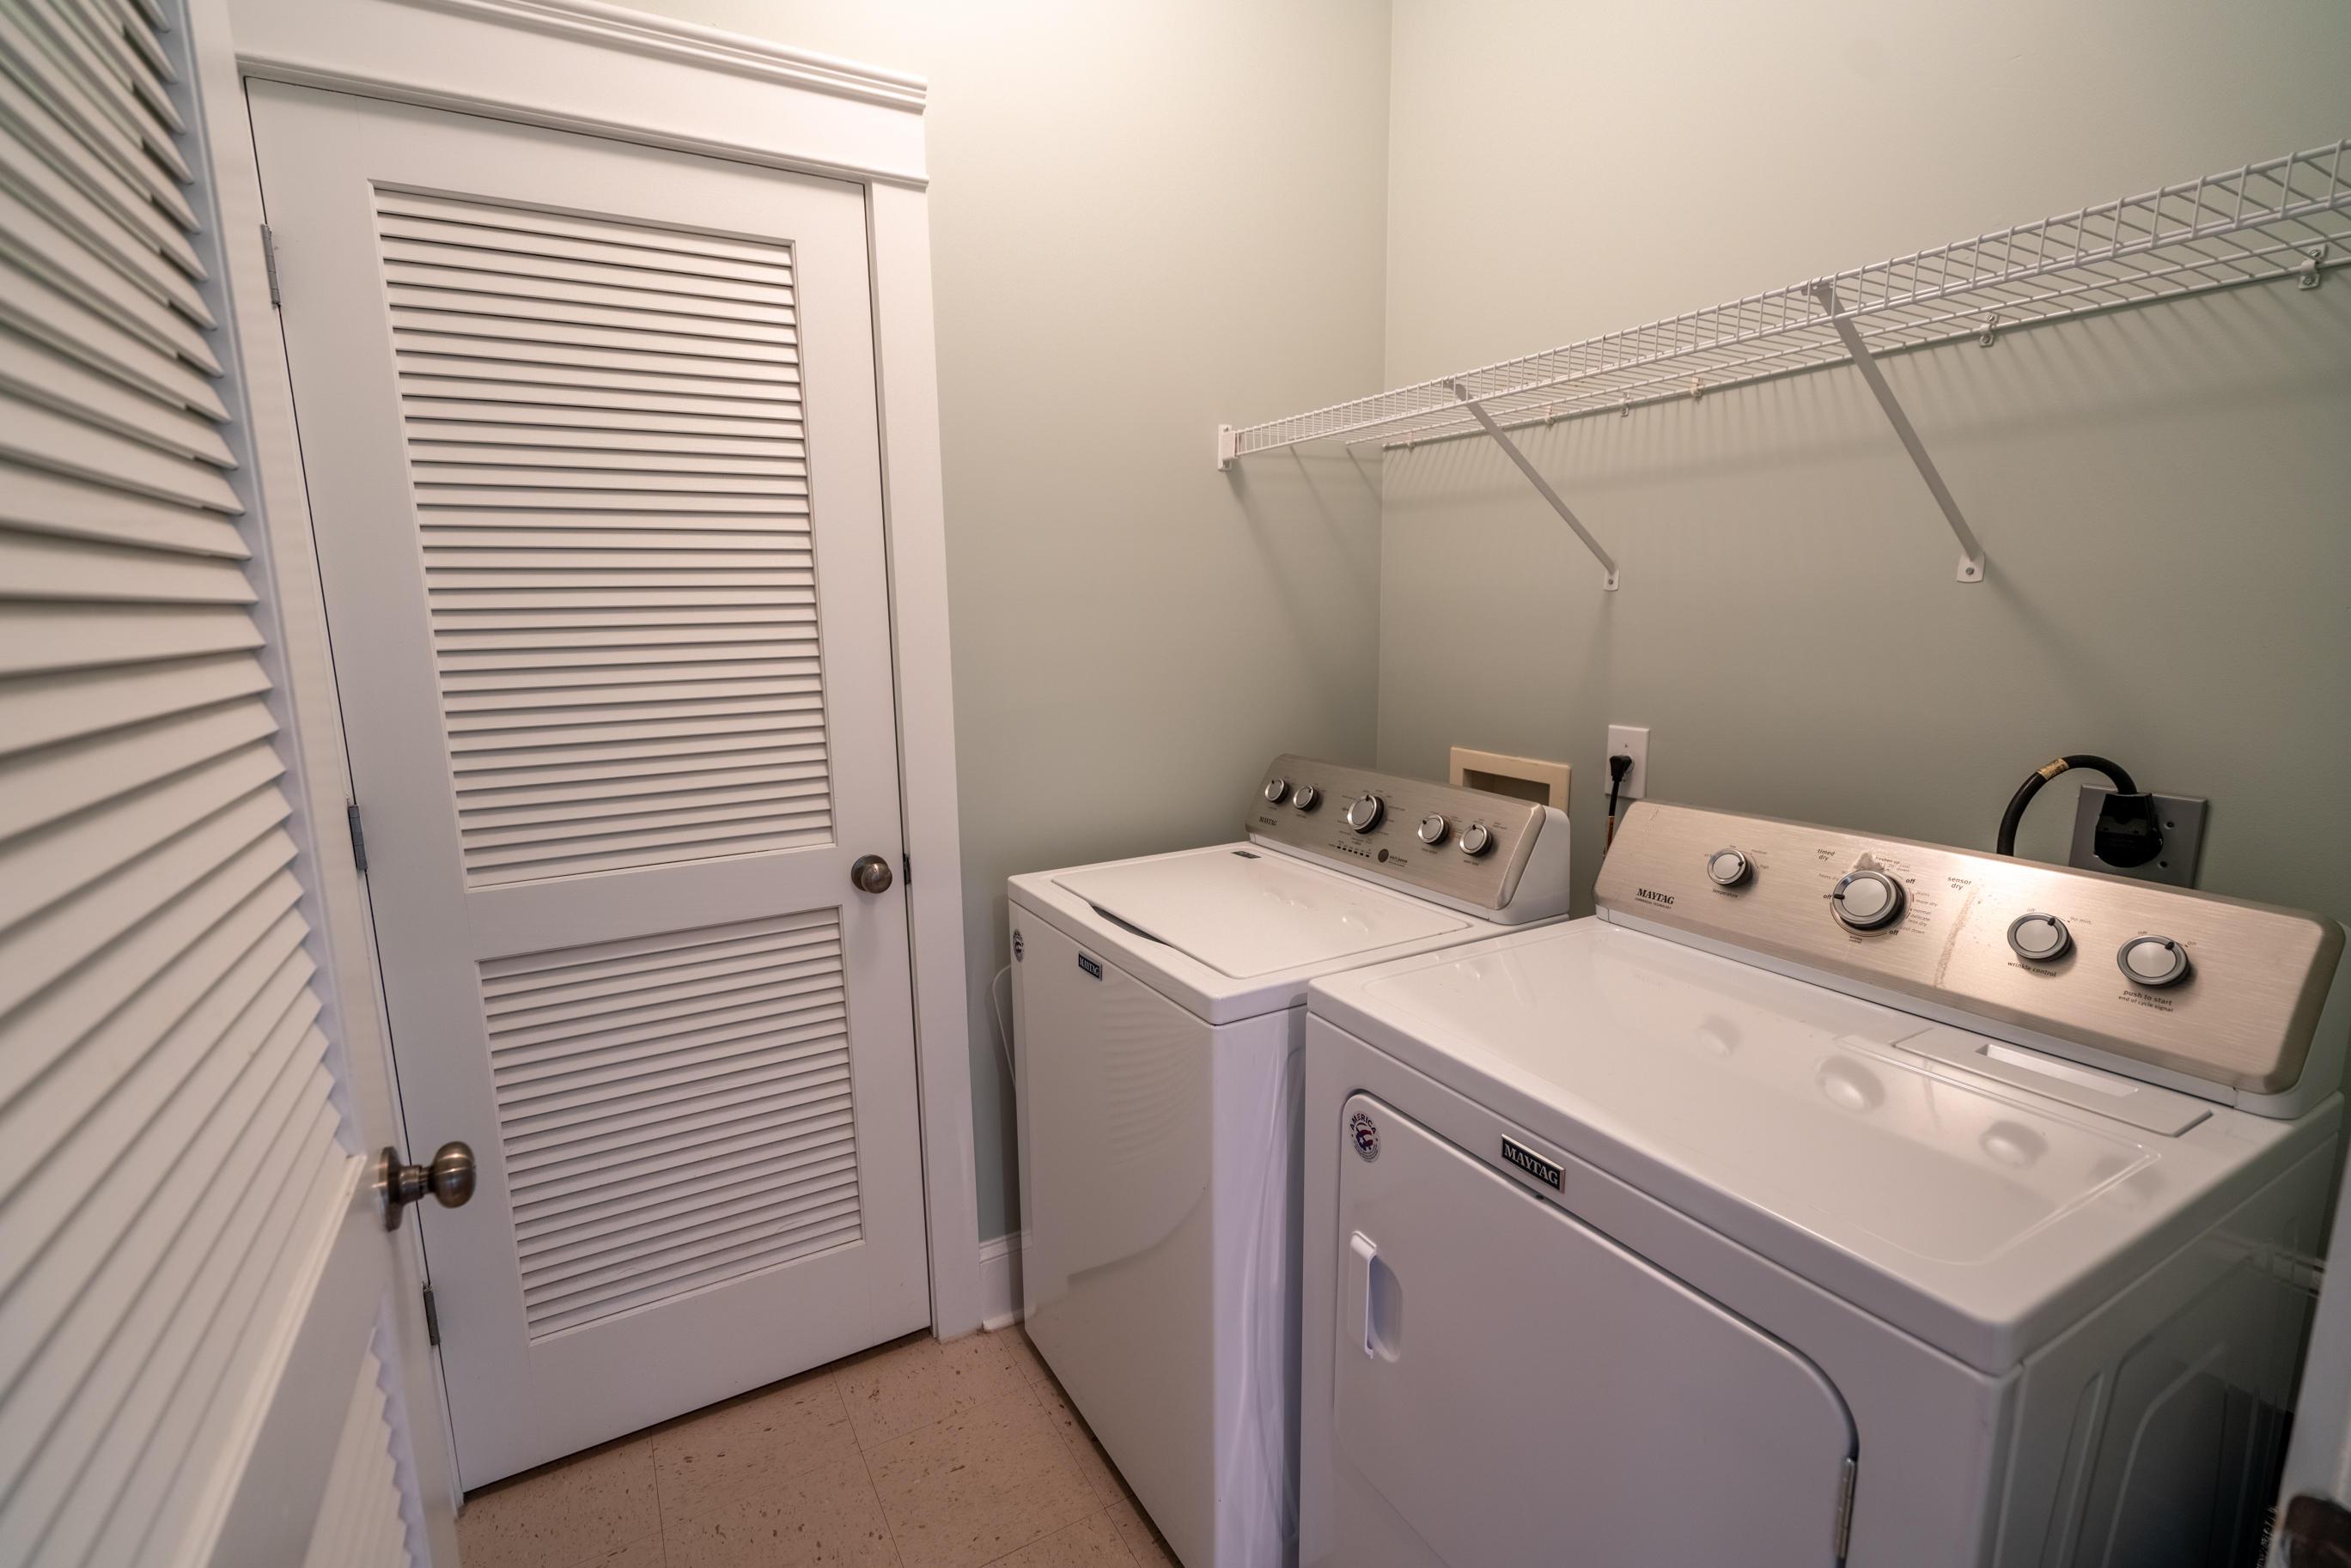 Etiwan Pointe Homes For Sale - 132 Winding Creek, Mount Pleasant, SC - 8